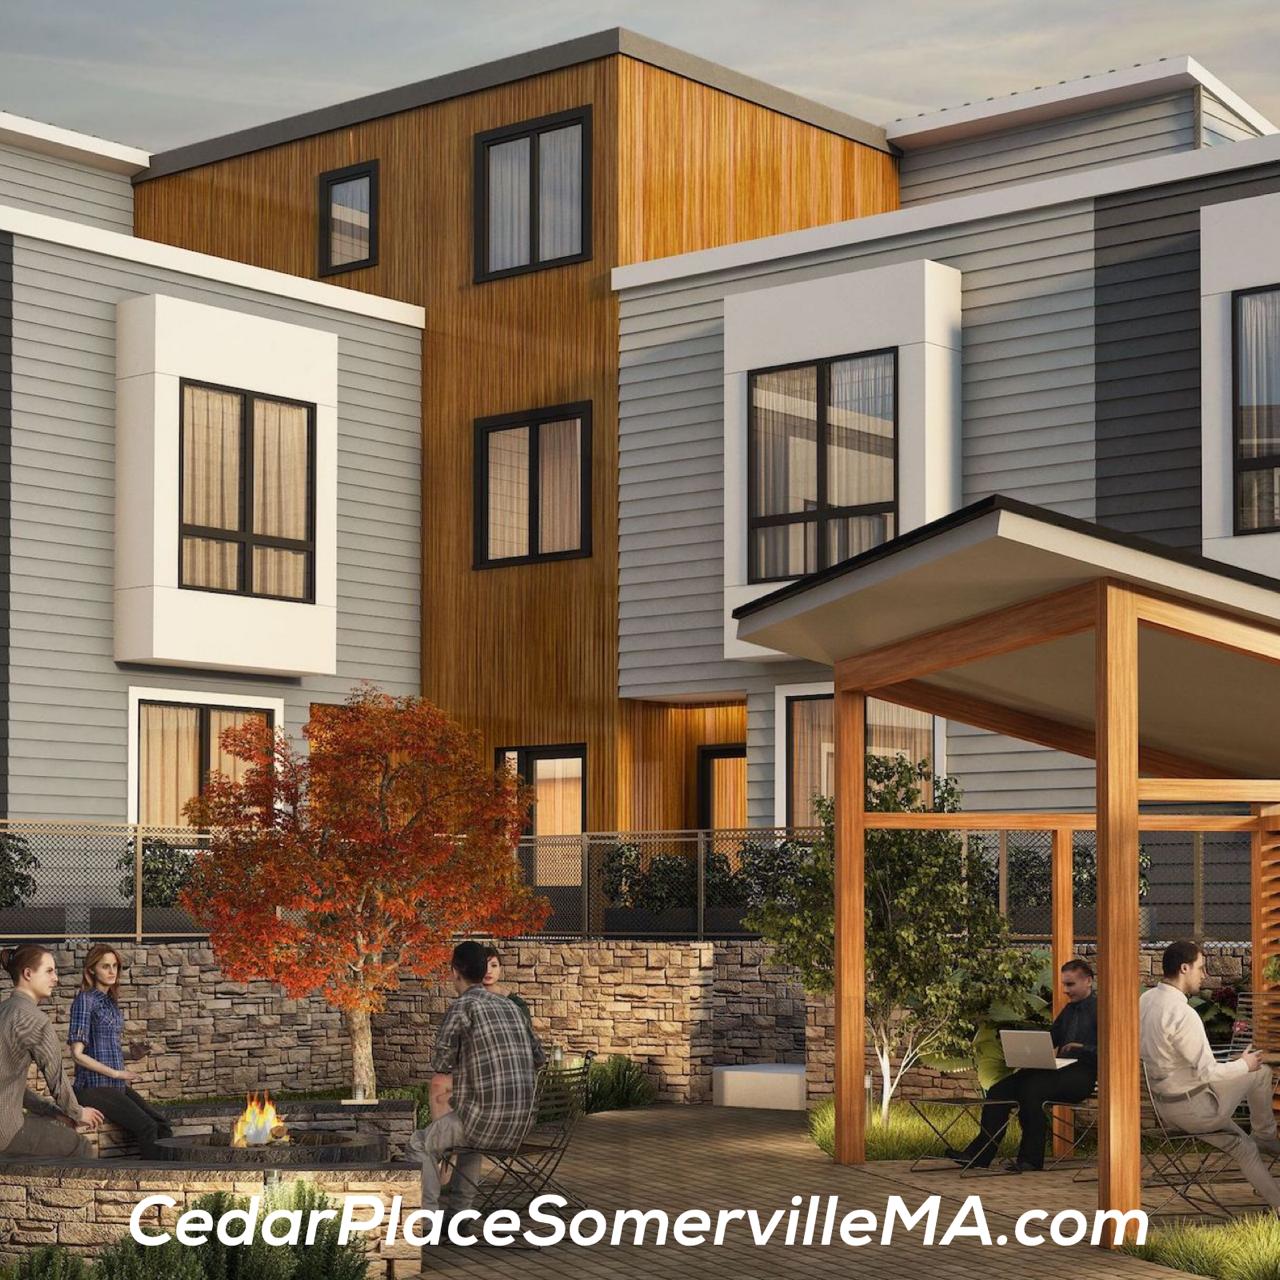 227 Cedar Street  Unit 2 | Somerville, MA